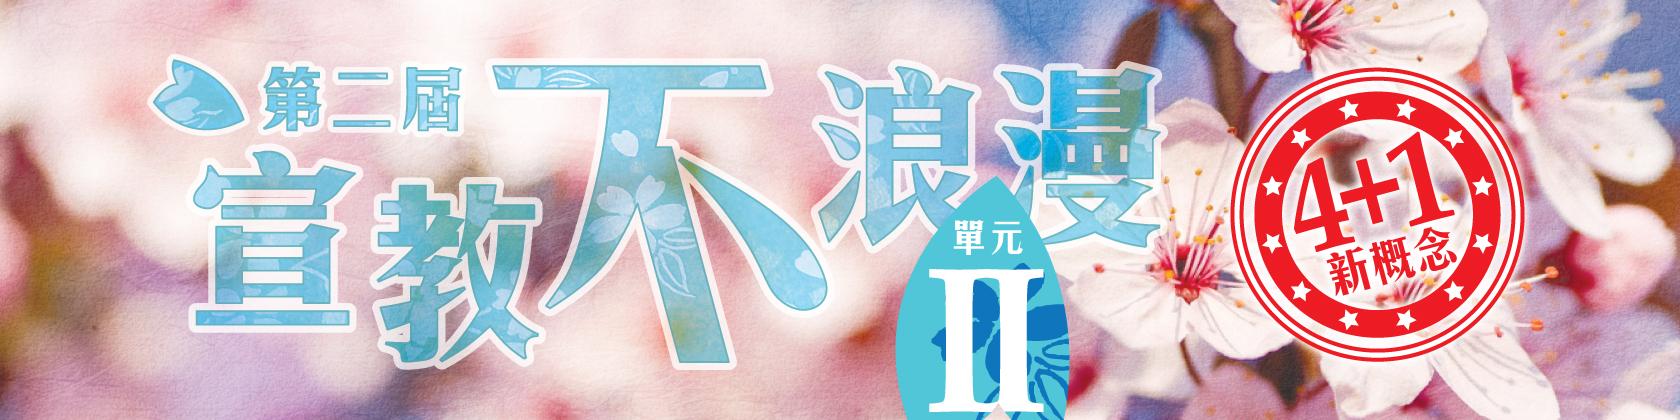 CB-05-宣教不浪漫web-banner-1680-x-420-v2-01